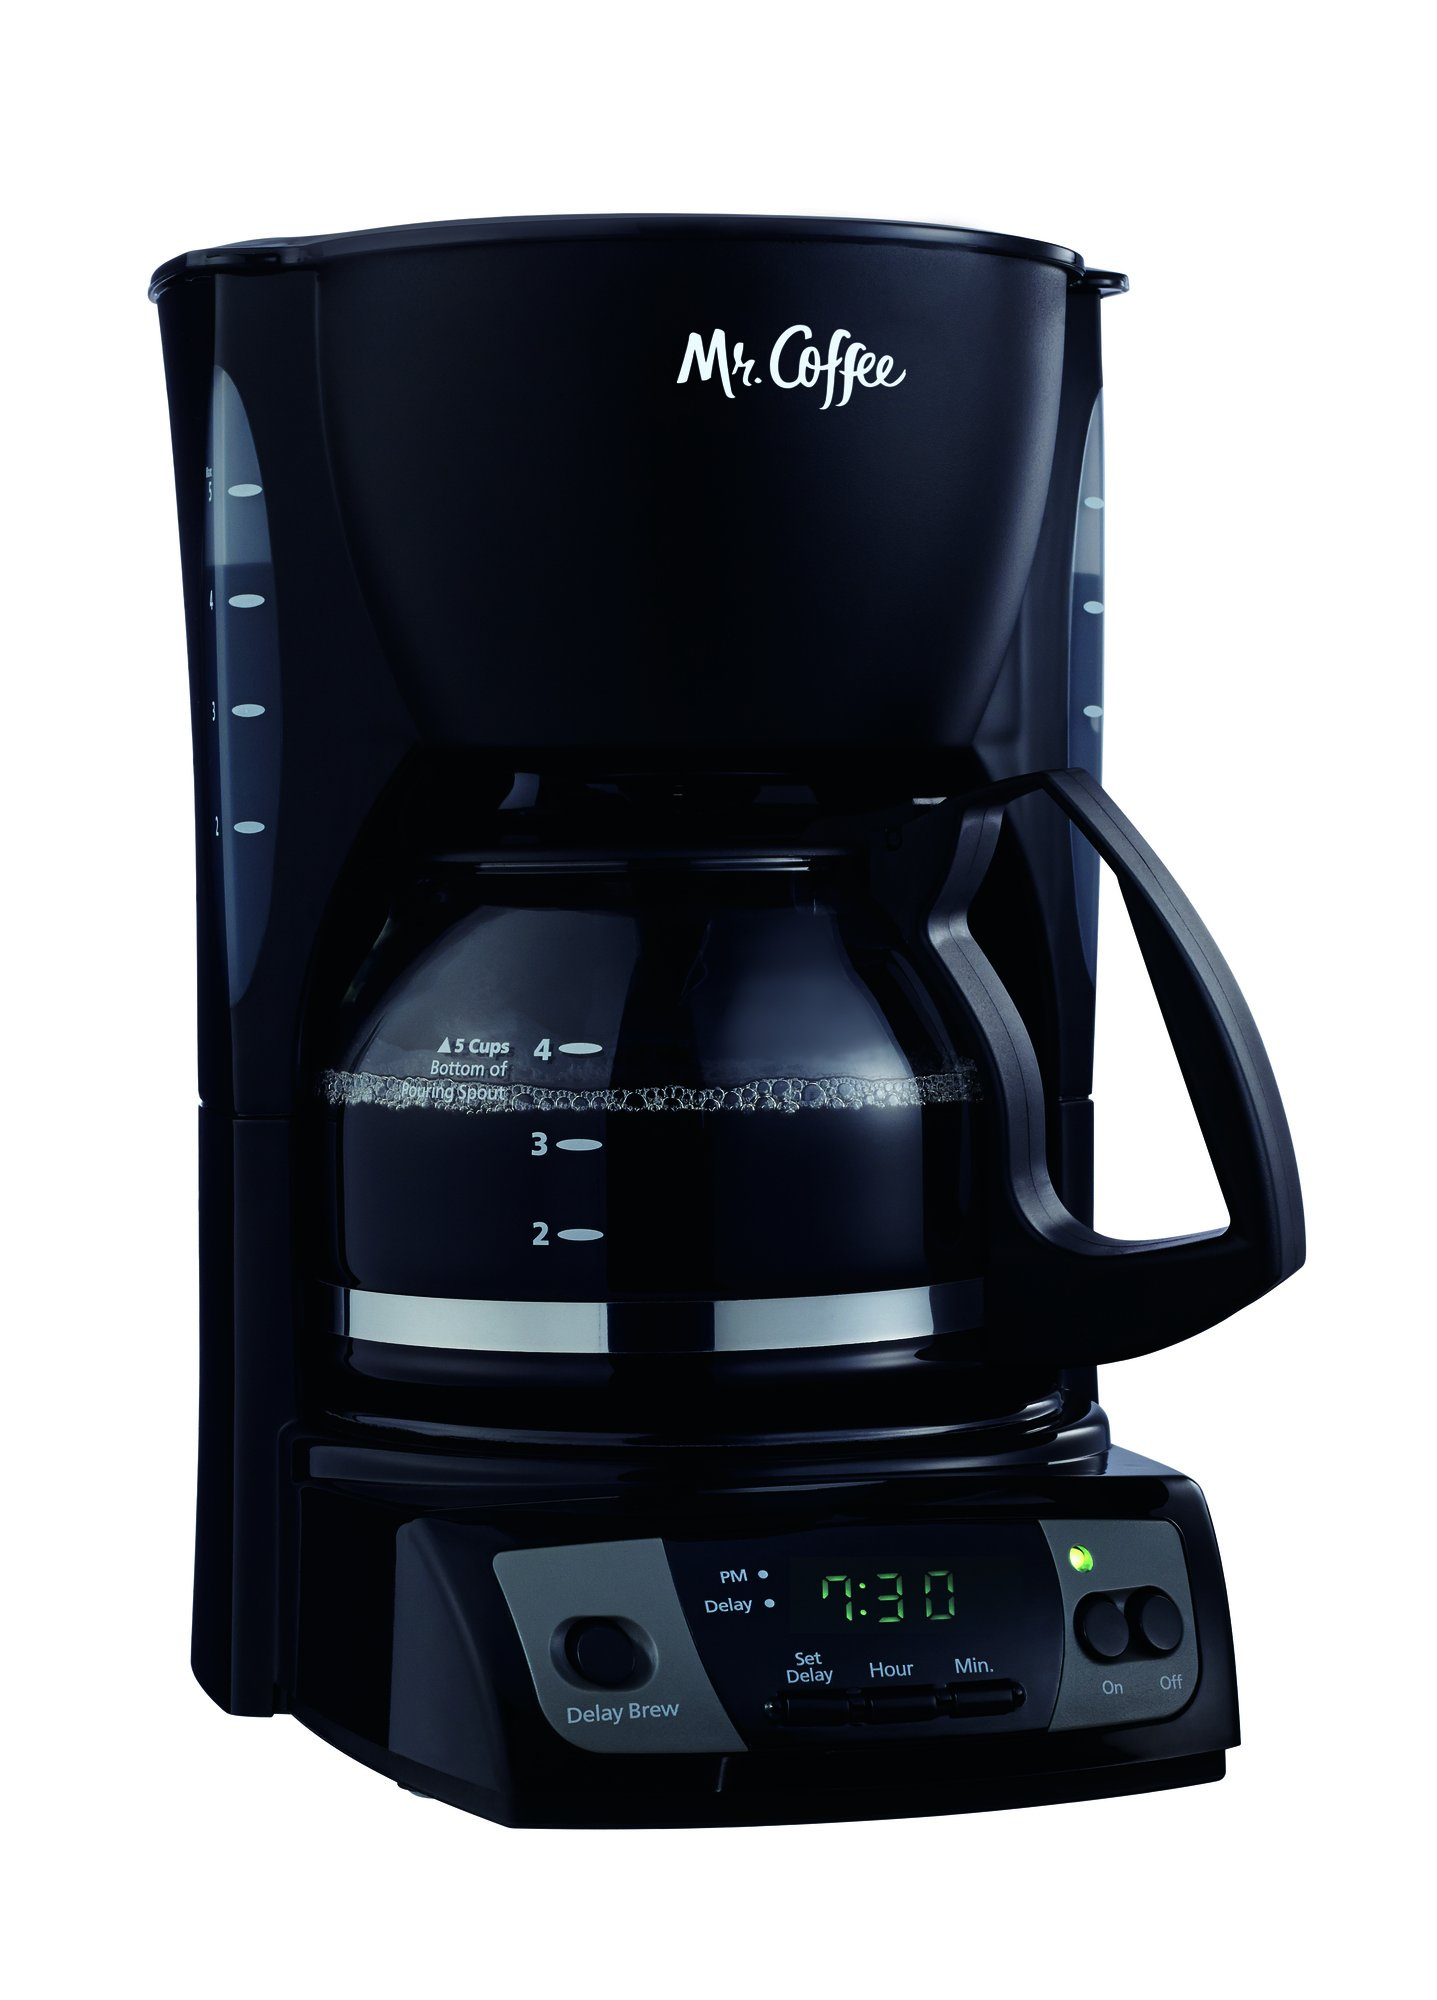 Mr. Coffee Simple Brew 5-Cup Programmable Coffee Maker, Black